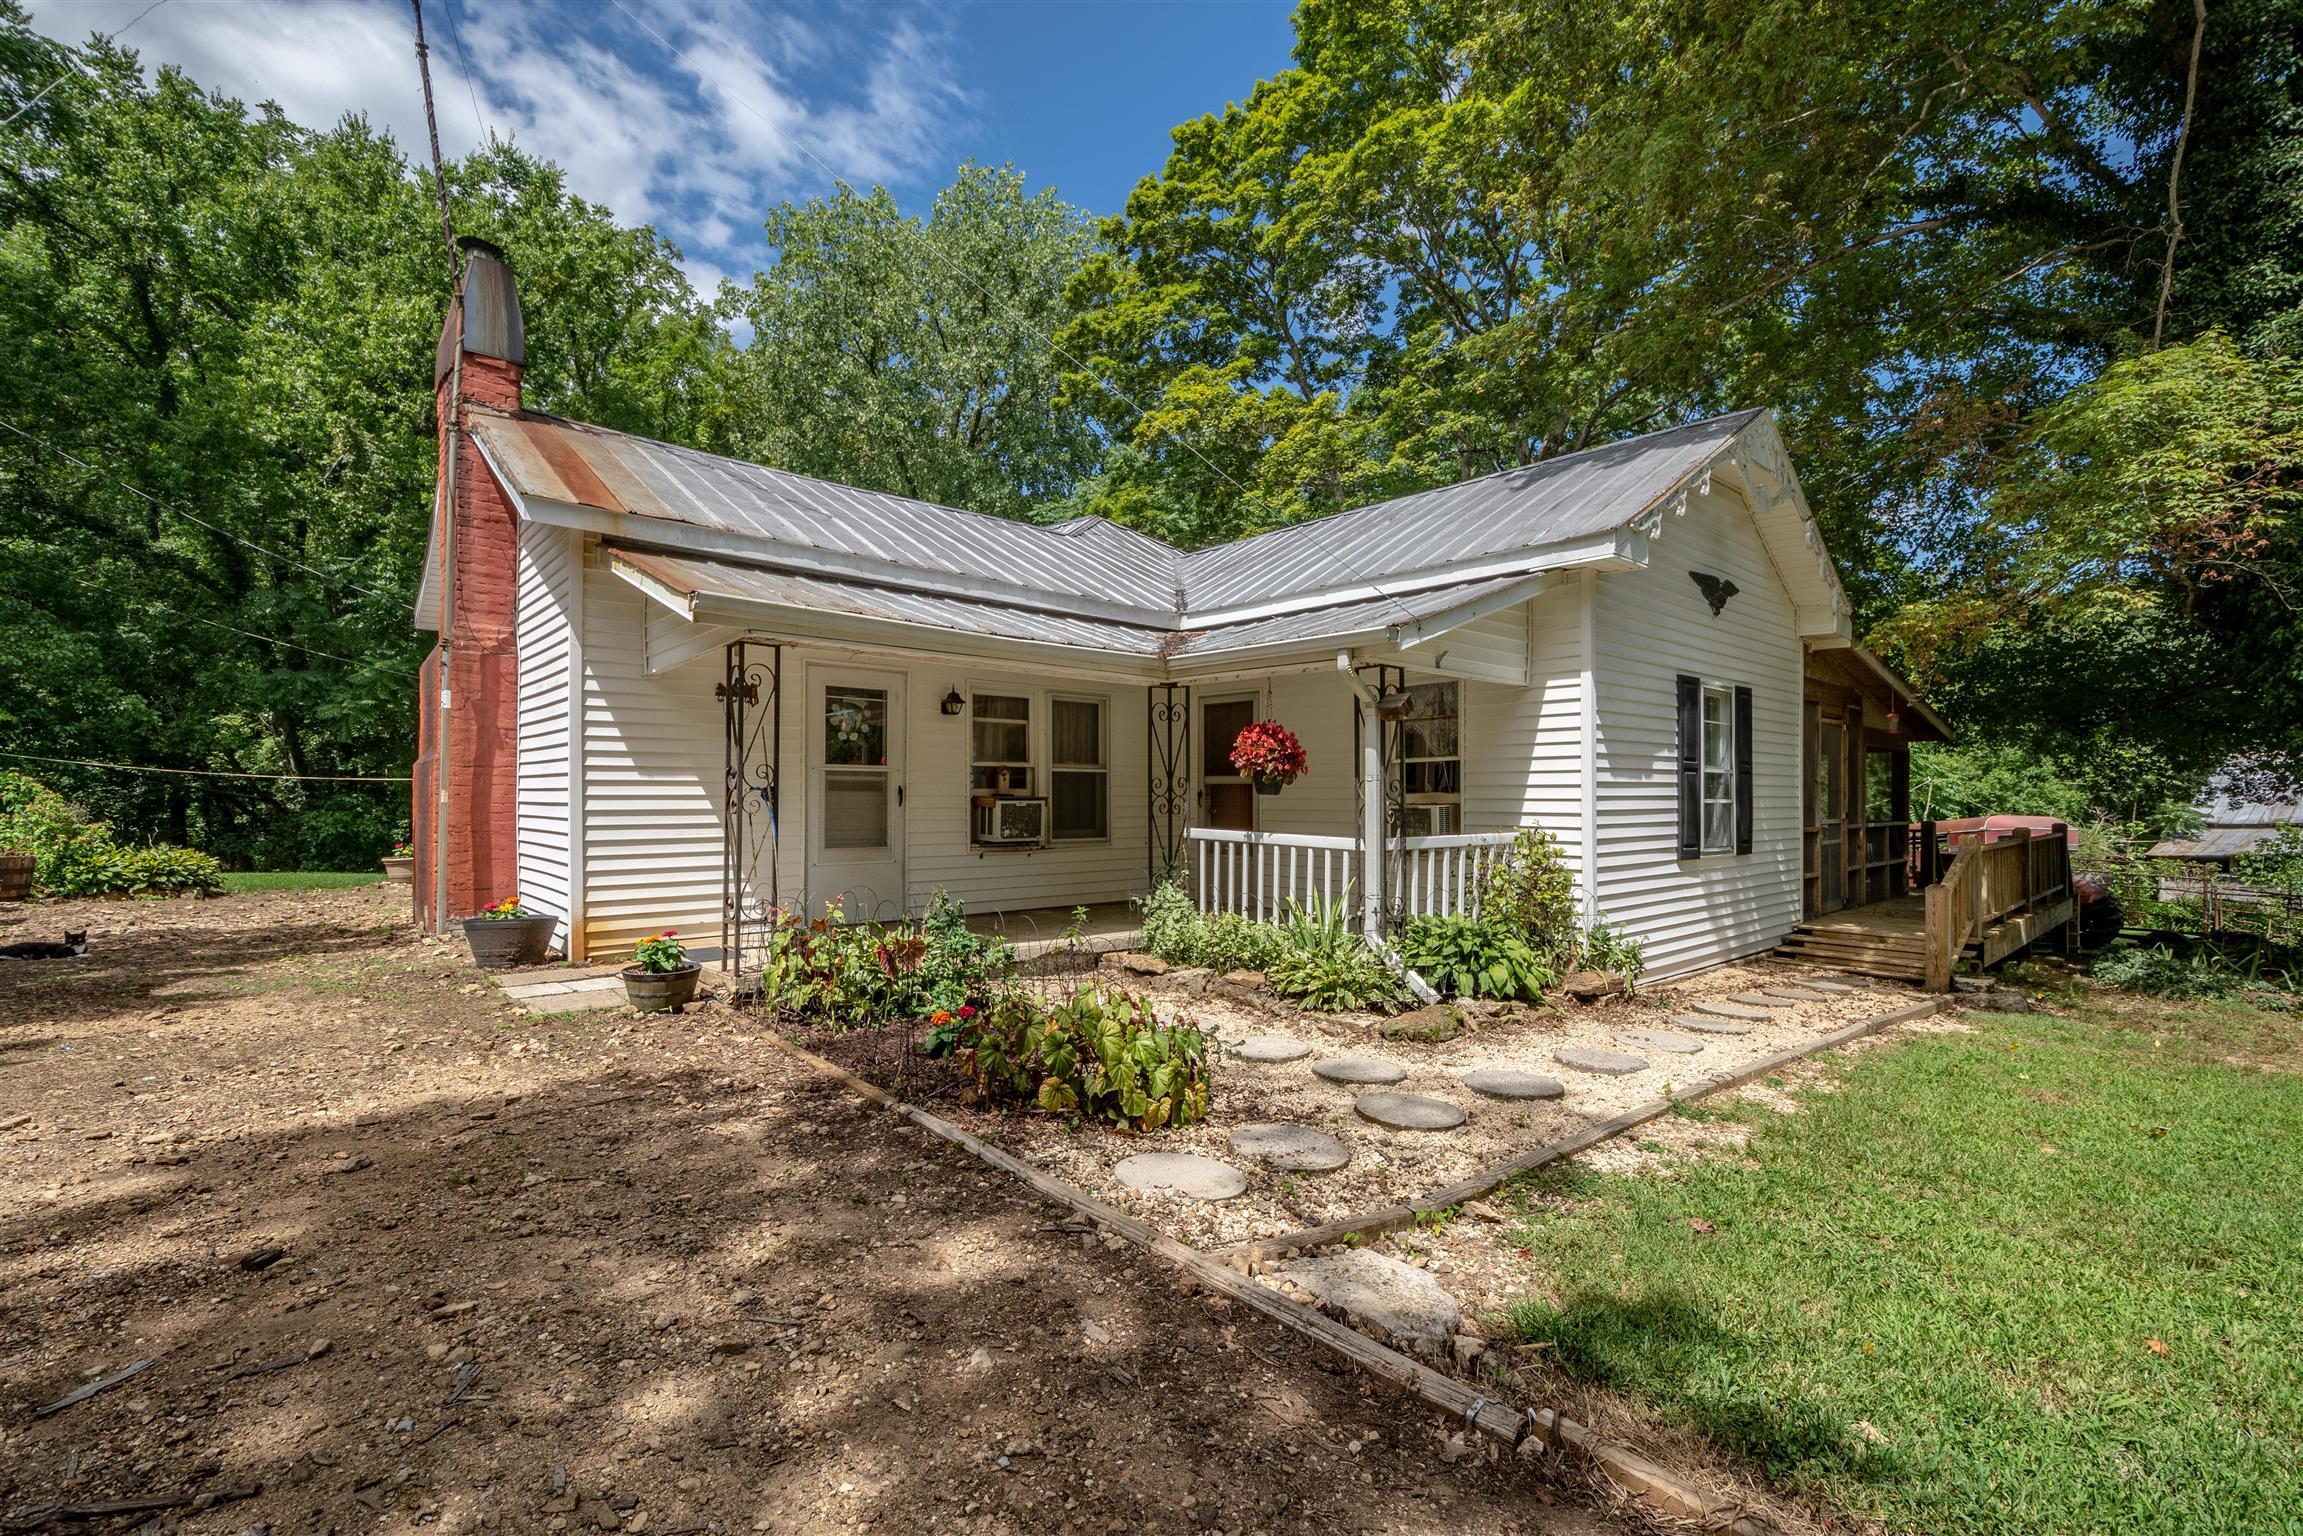 1080 Johnson Branch Rd, Pulaski, TN 38478 - Pulaski, TN real estate listing